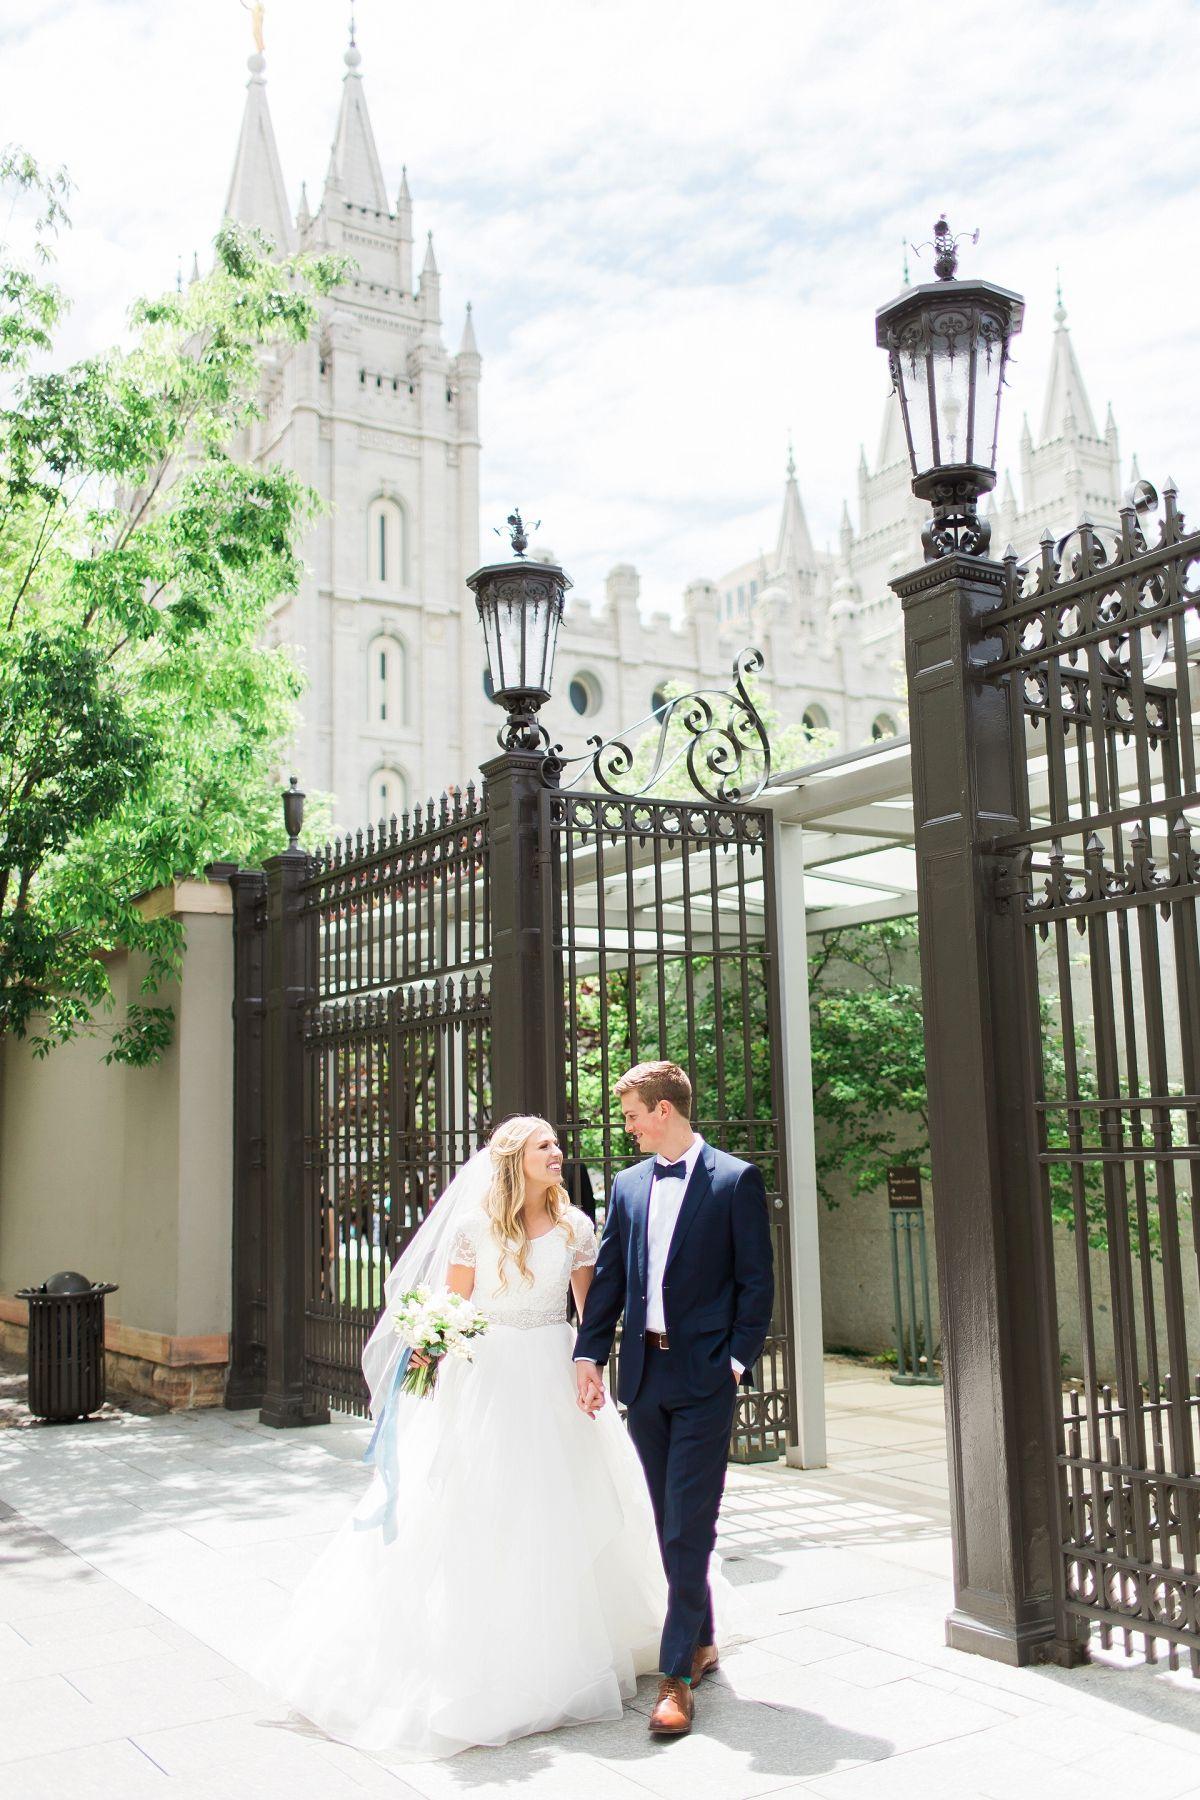 Chelsea zach utah summer backyard wedding photography wedding